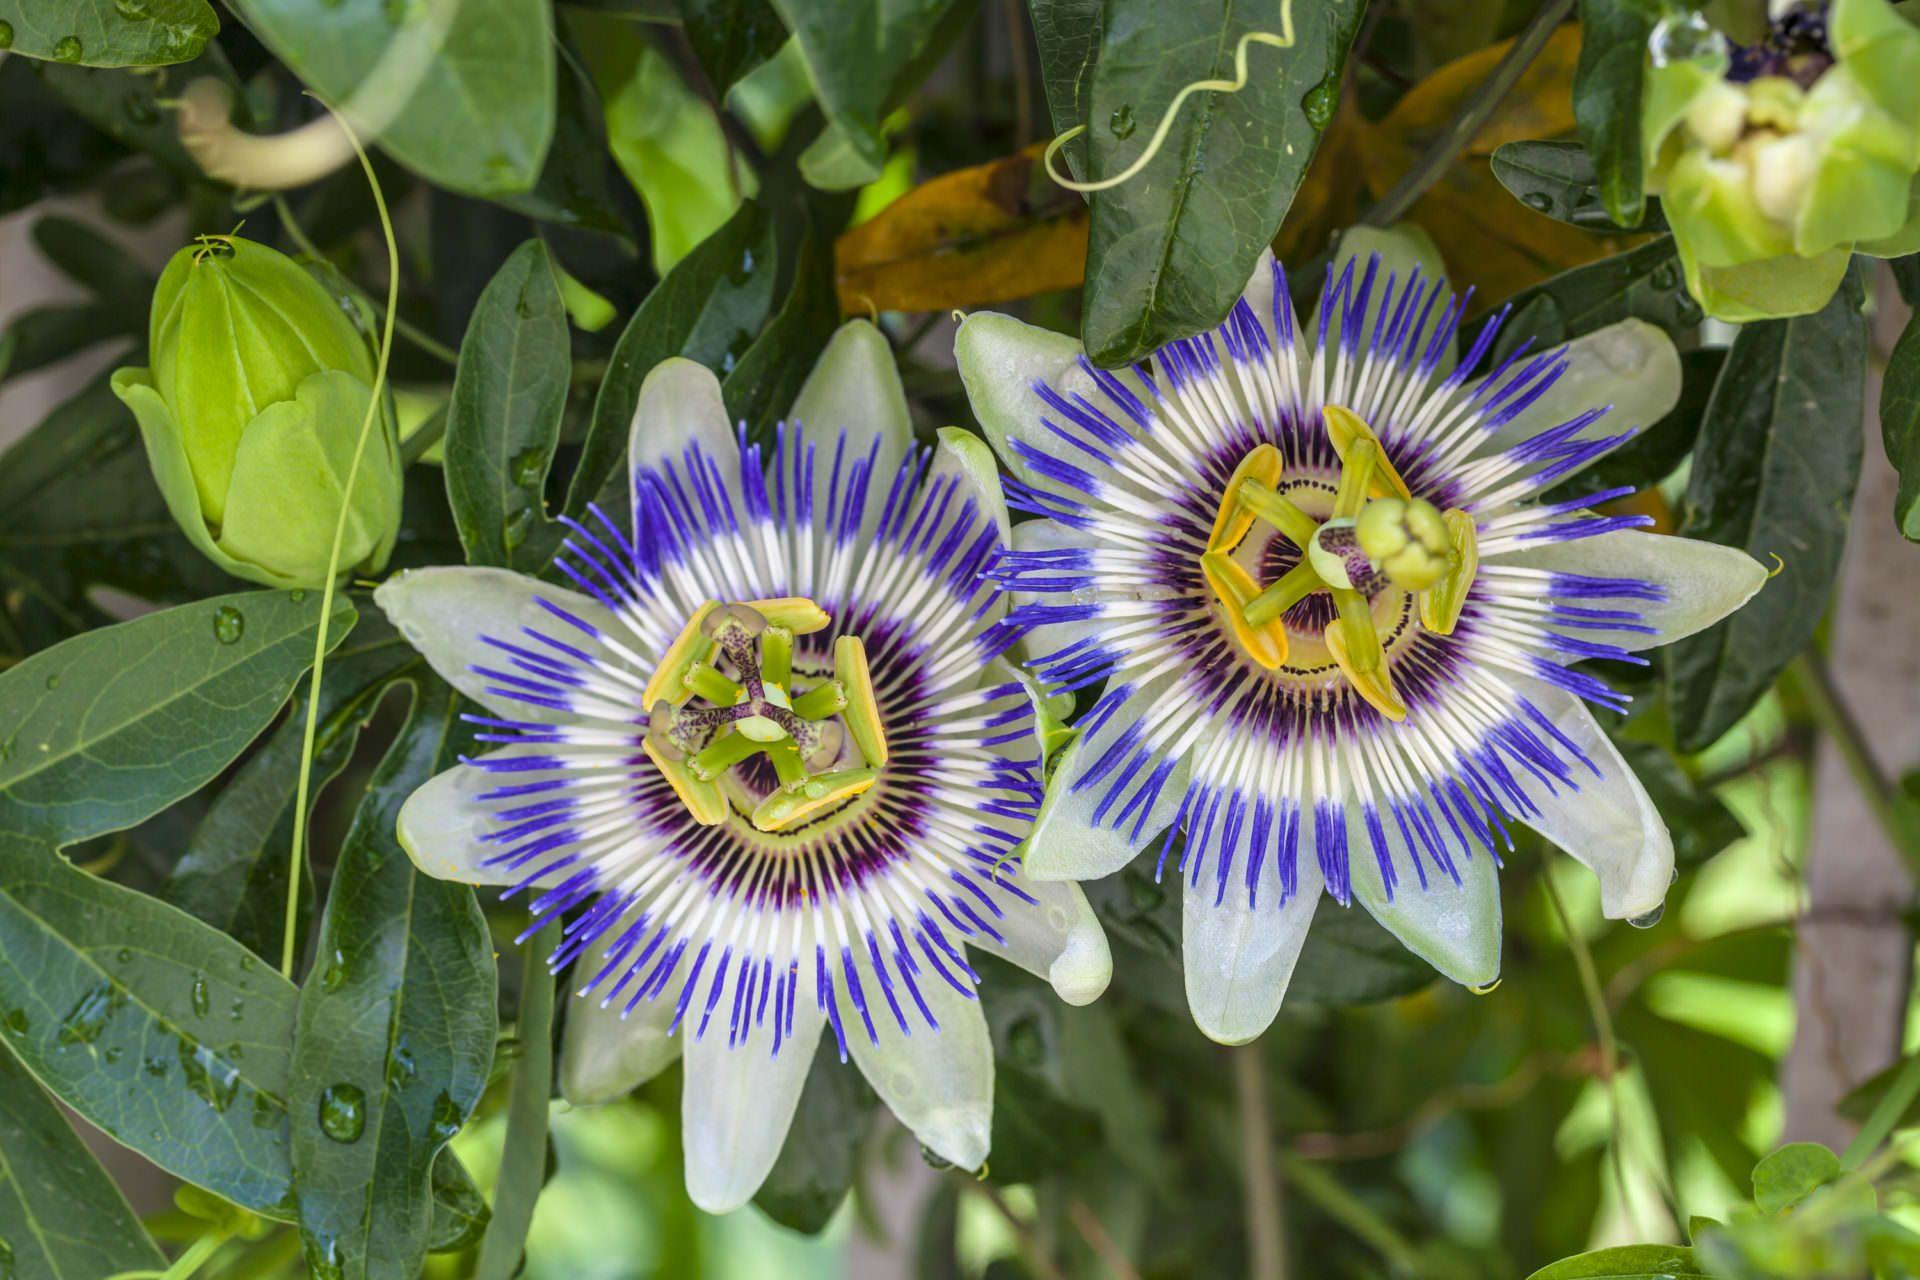 Passion Flower Blue For Sale At Desert Horizon Nursery Passiflora Caerulea Blue Passion Flower Passion Flower